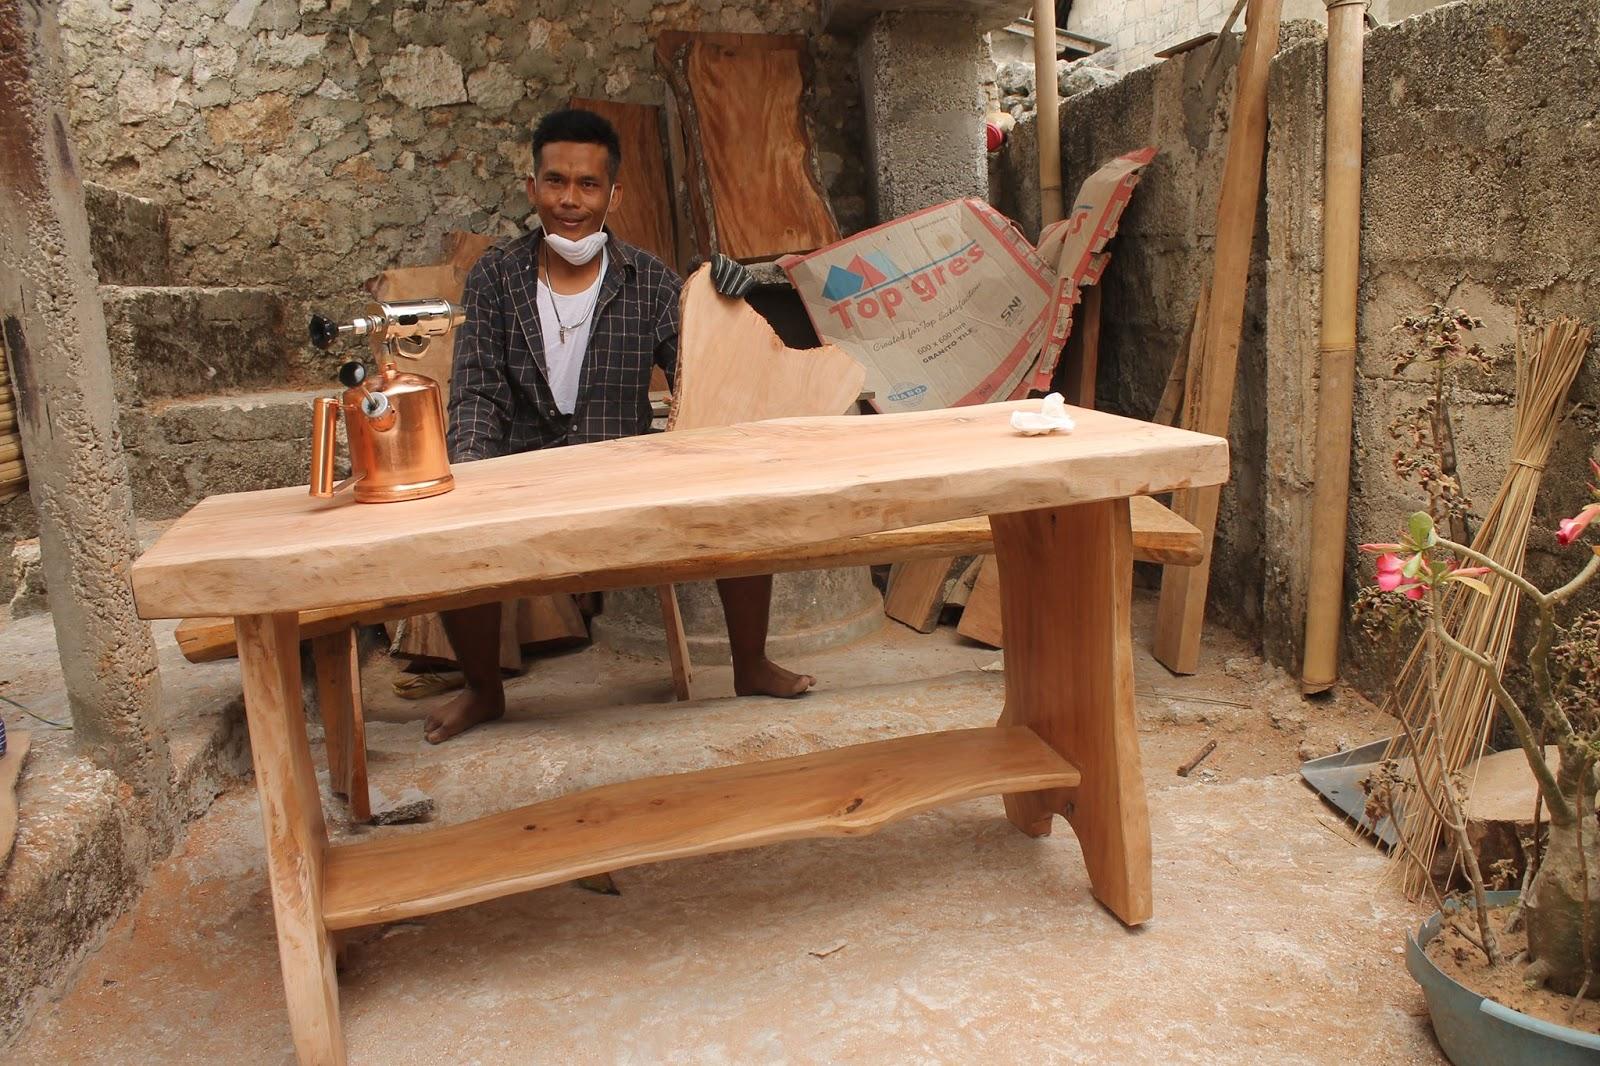 Limbah Kayu Jadi Furniture Antik Wak Laba